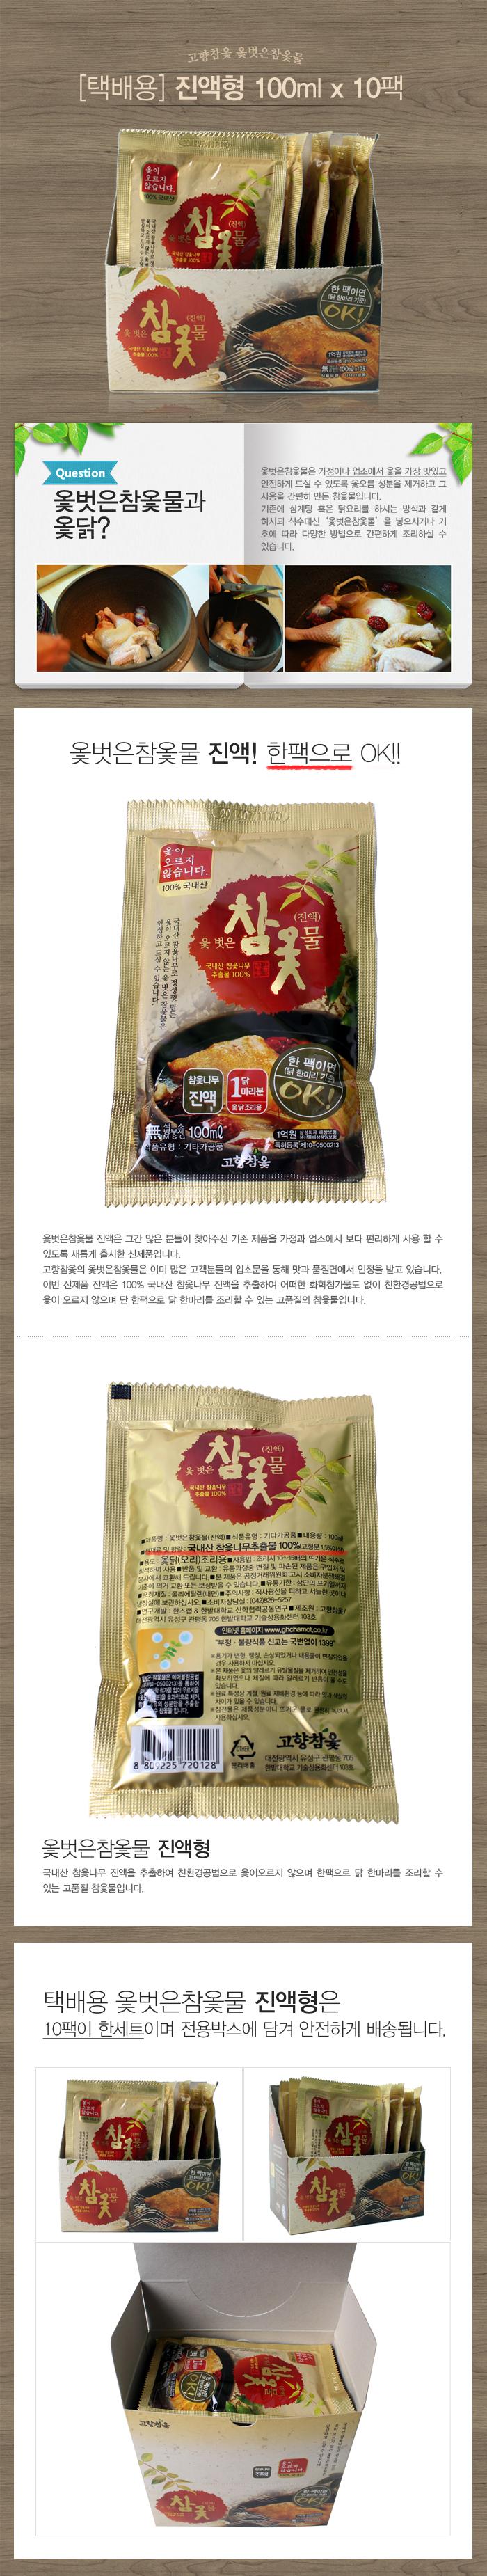 product02_03_01.jpg